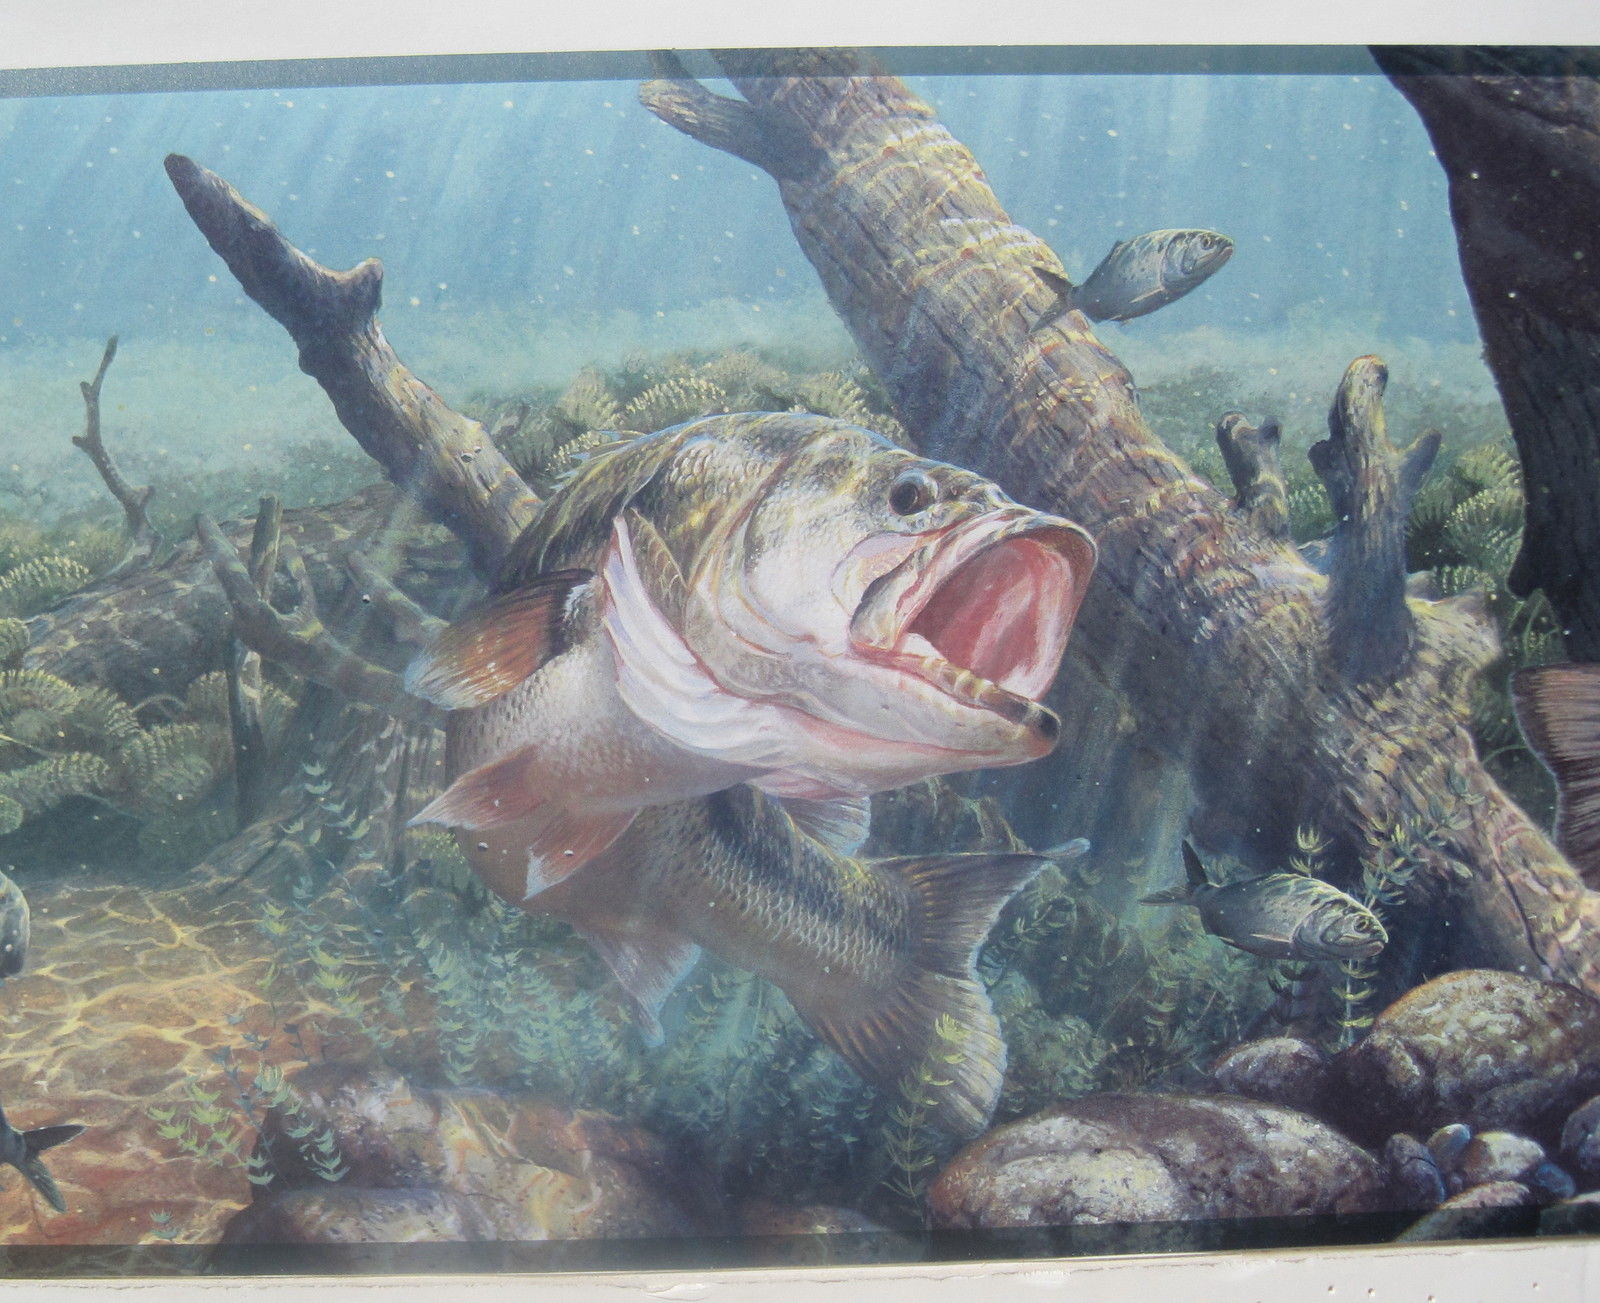 largemouth bass fishing wallpaper screensaver 1600x1303